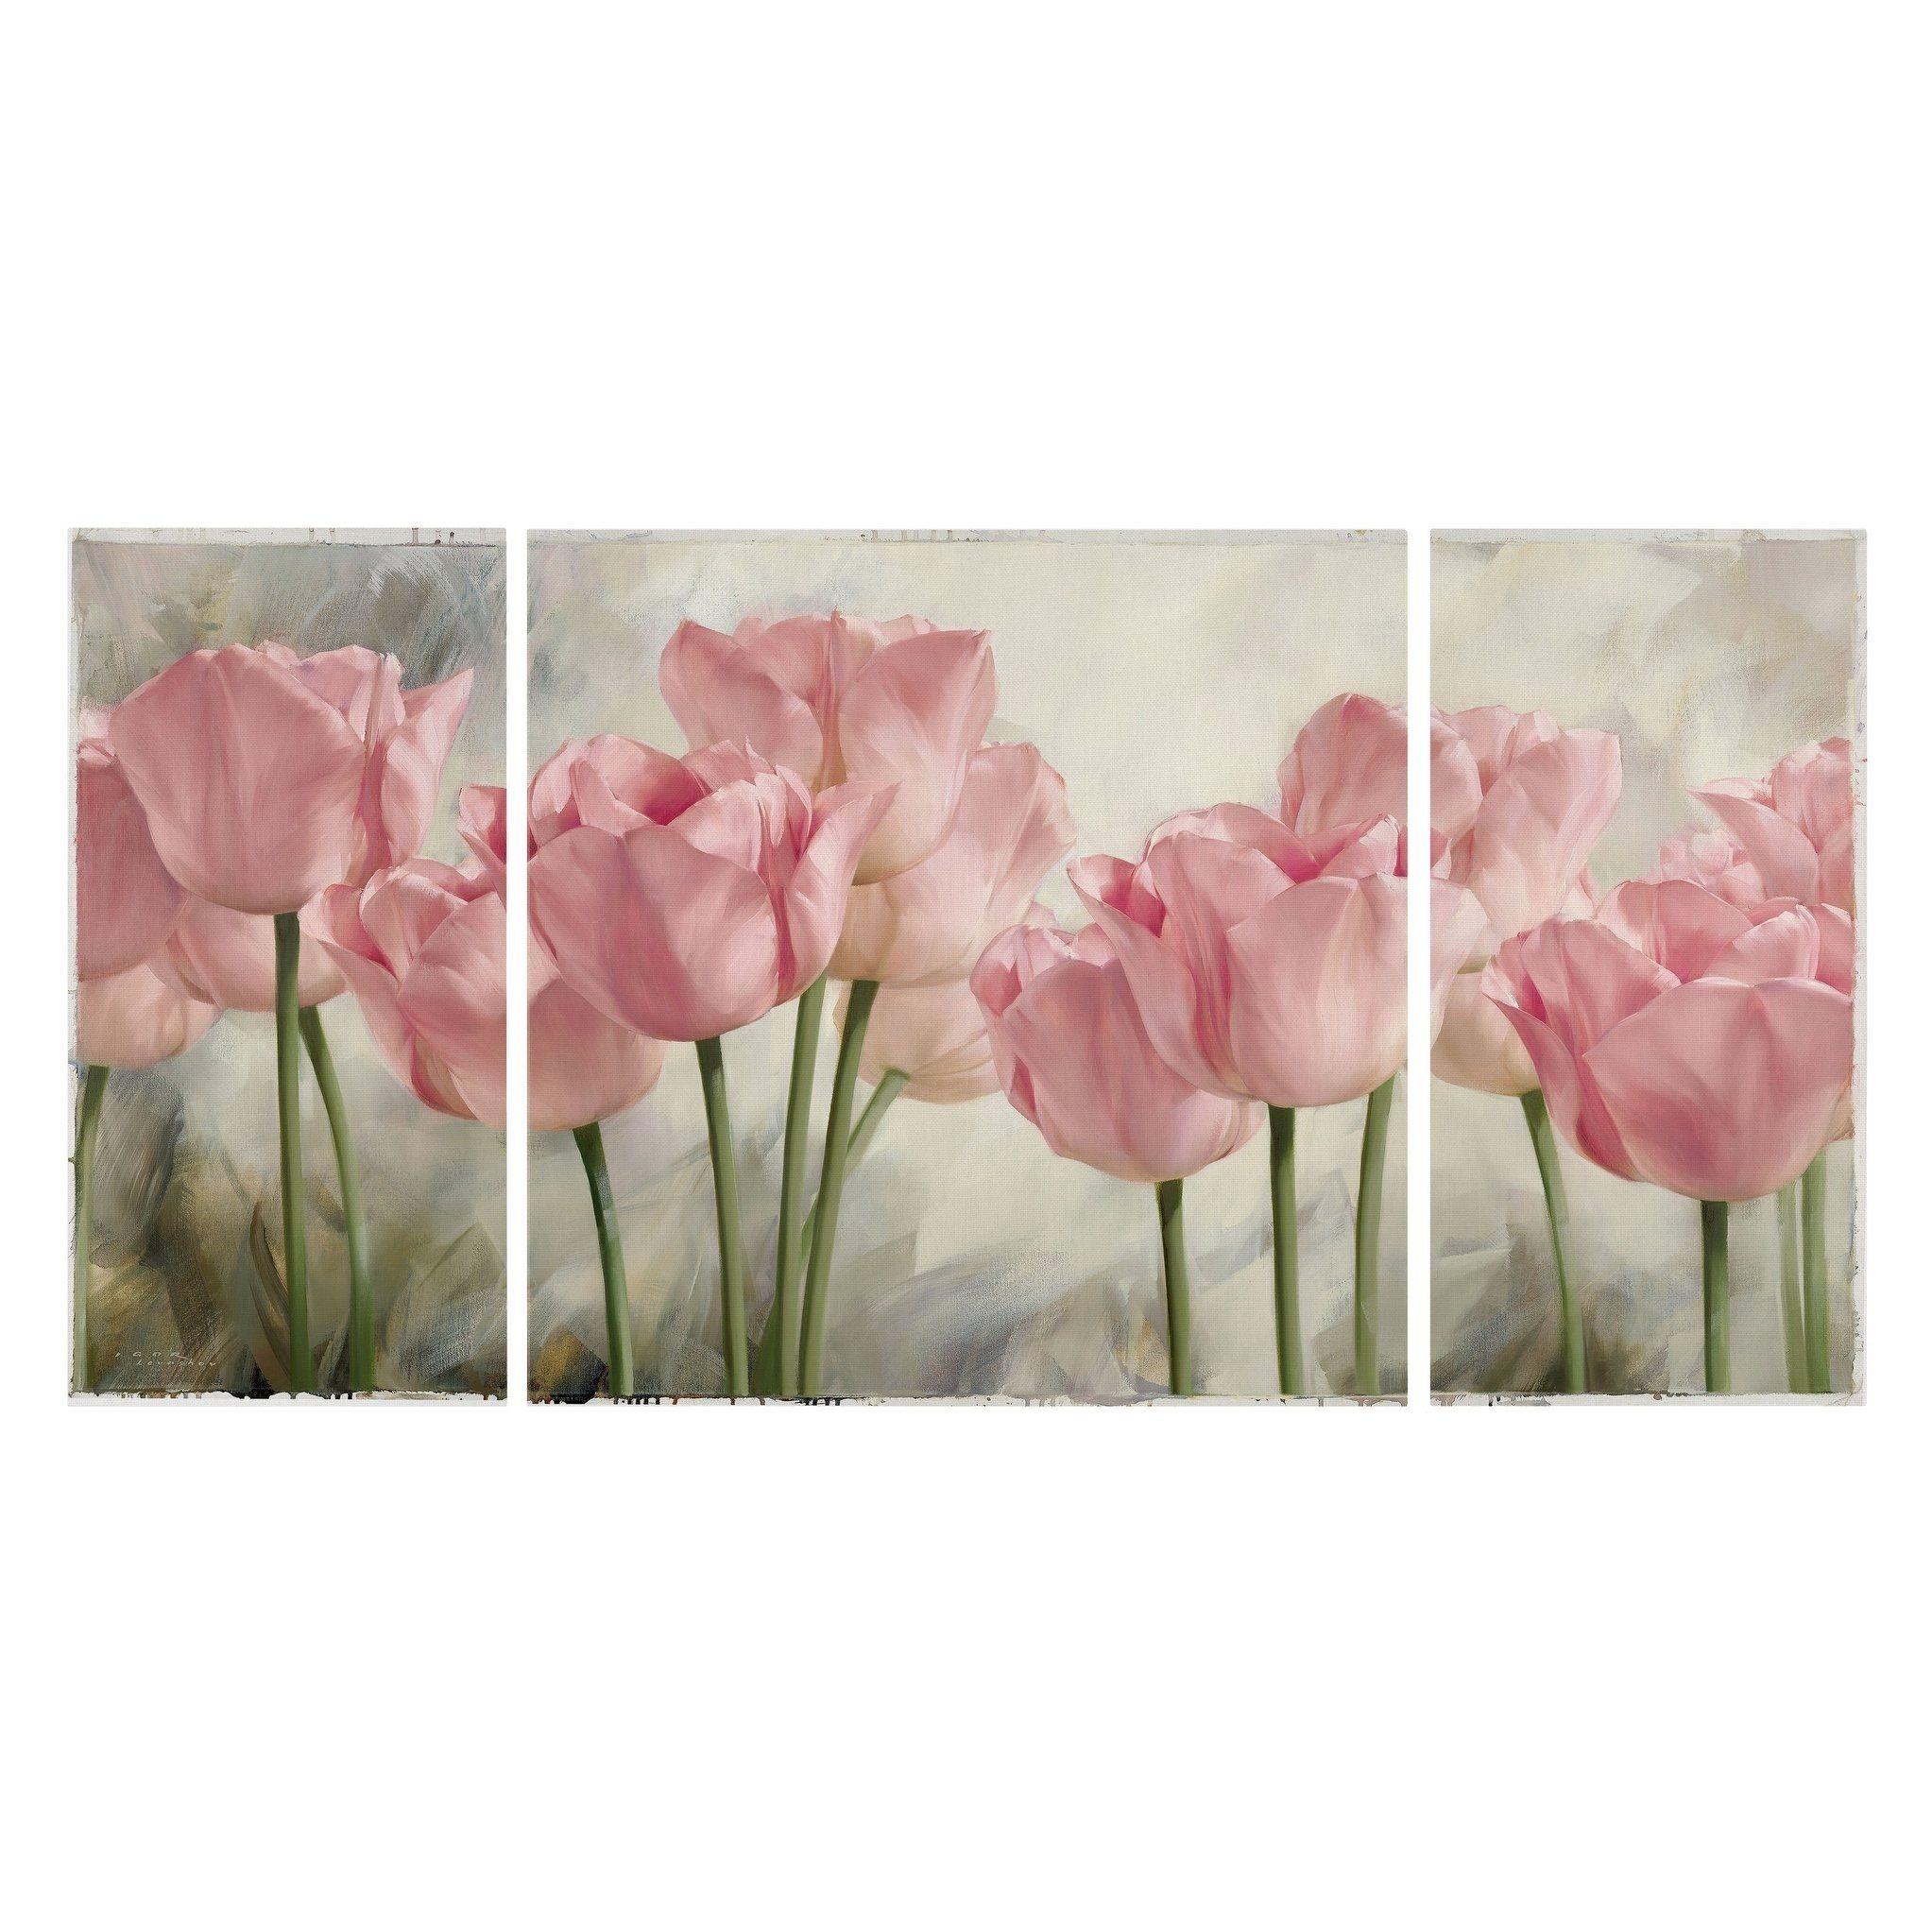 Decoration Cross Stitch 5D DIY Oil Painting Tulips Diamond Painting